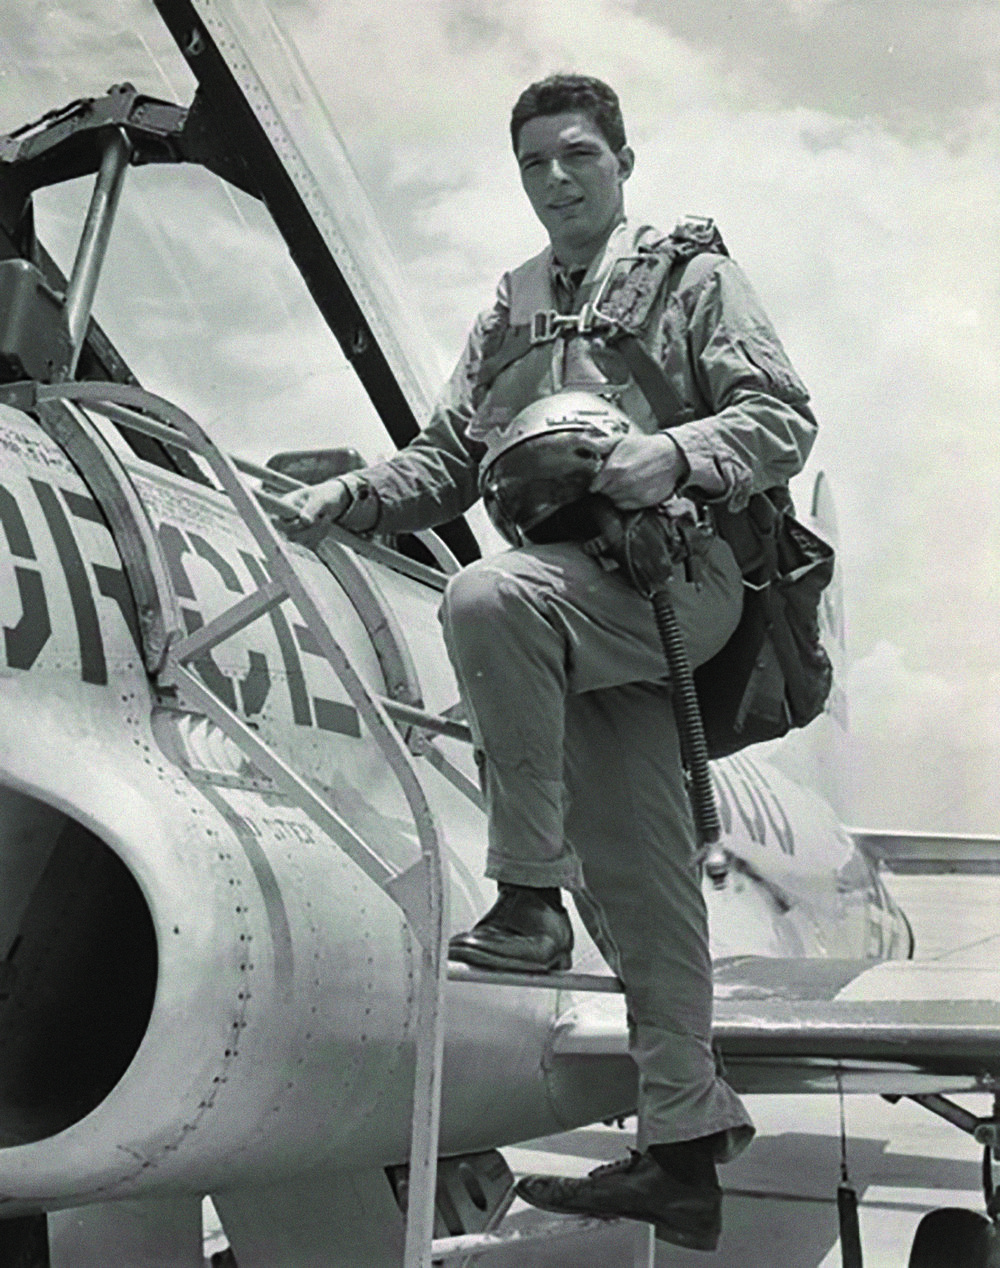 June-17-Keyser-Airforce.jpg